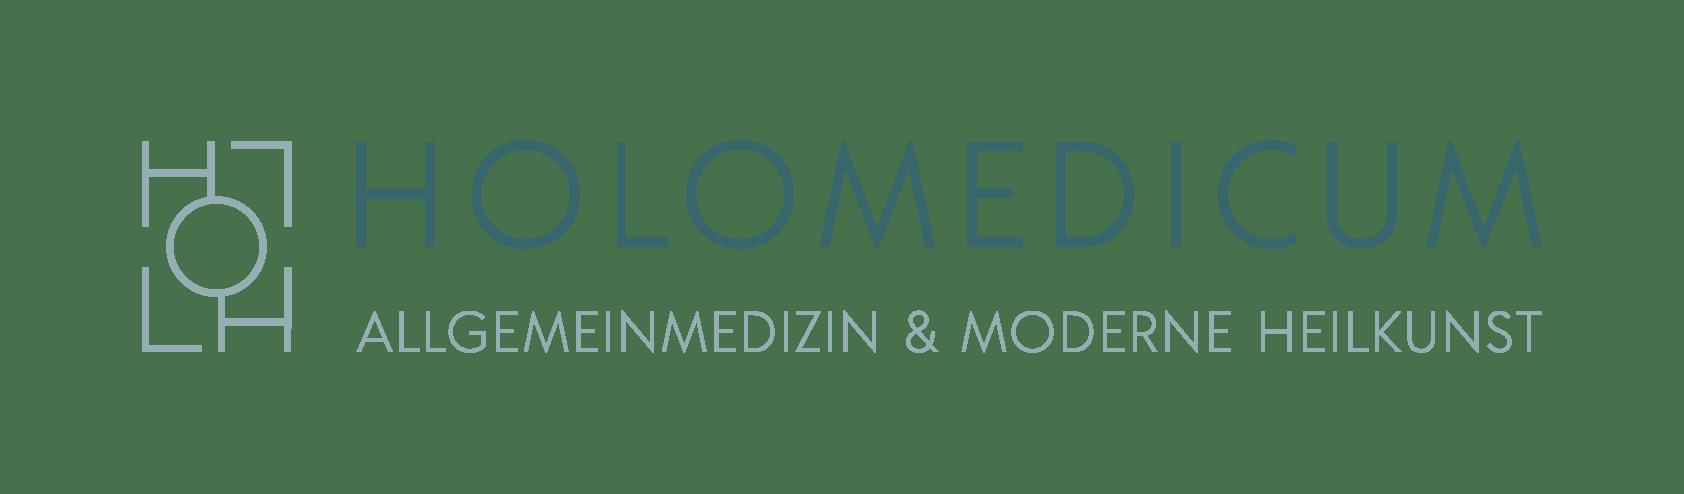 Praxis Holomedicum